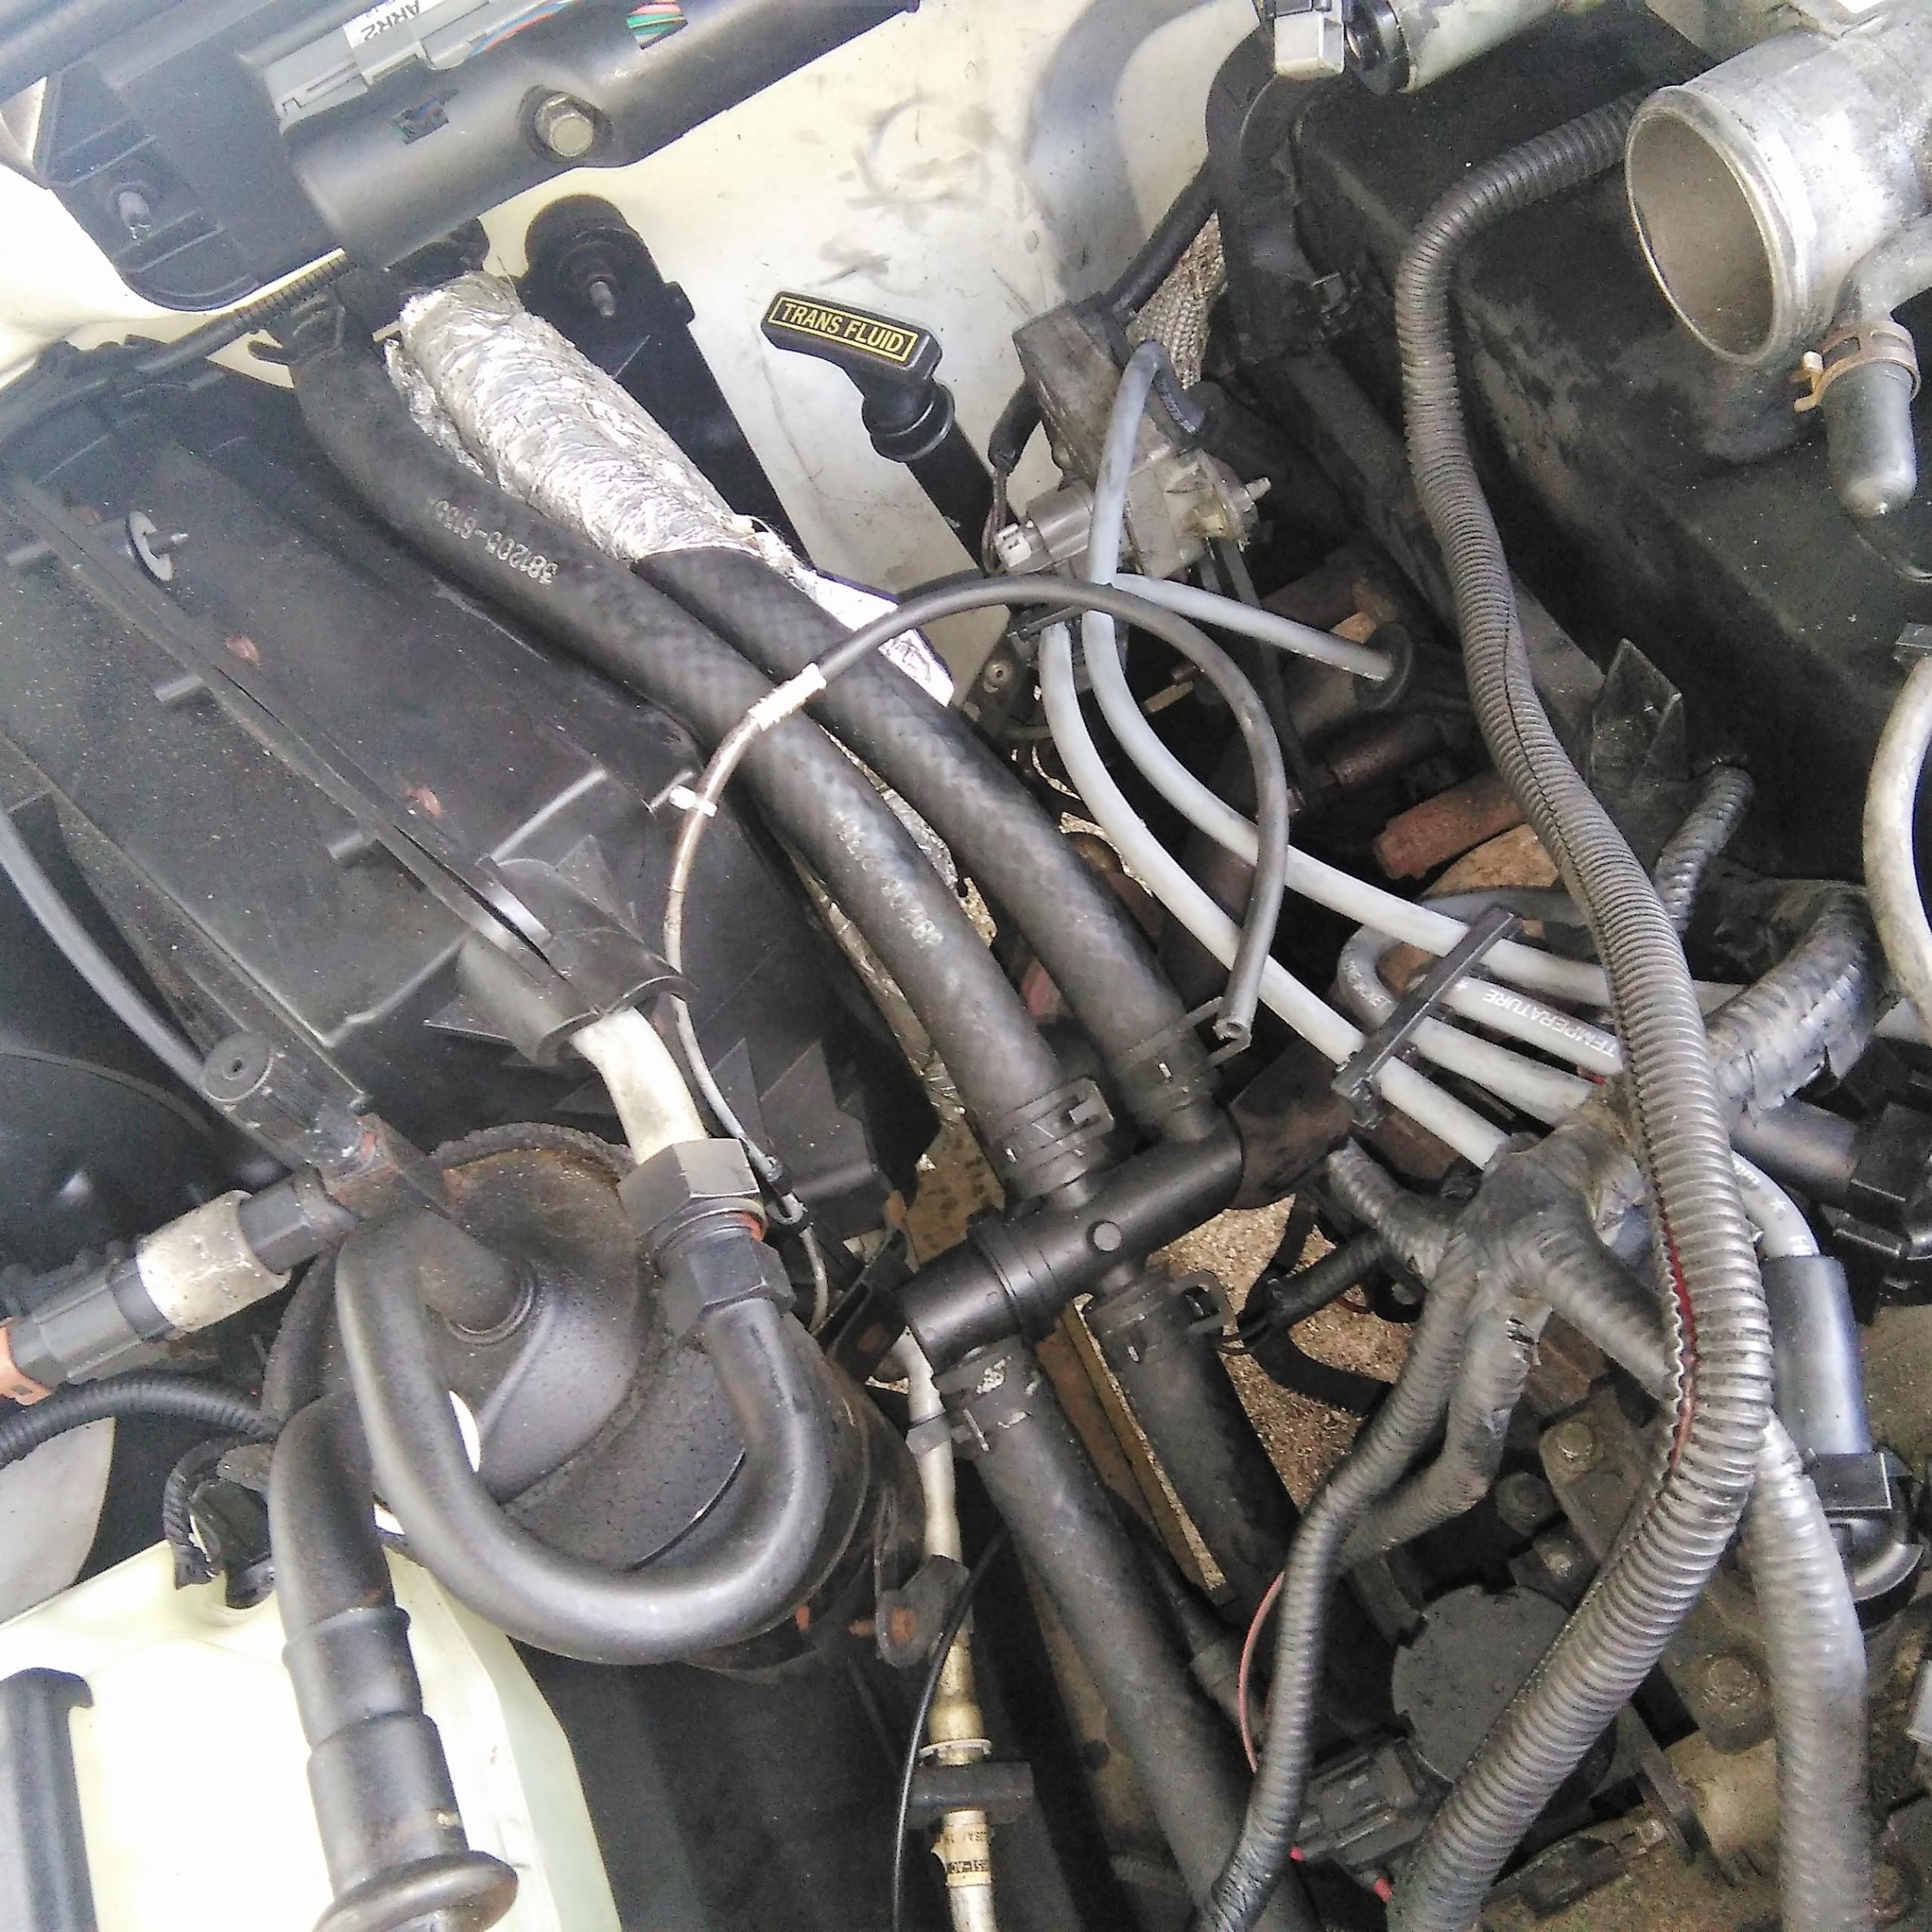 The Spark Plug Fun Begins - 97 Ford Ranger 2.3L Sohc